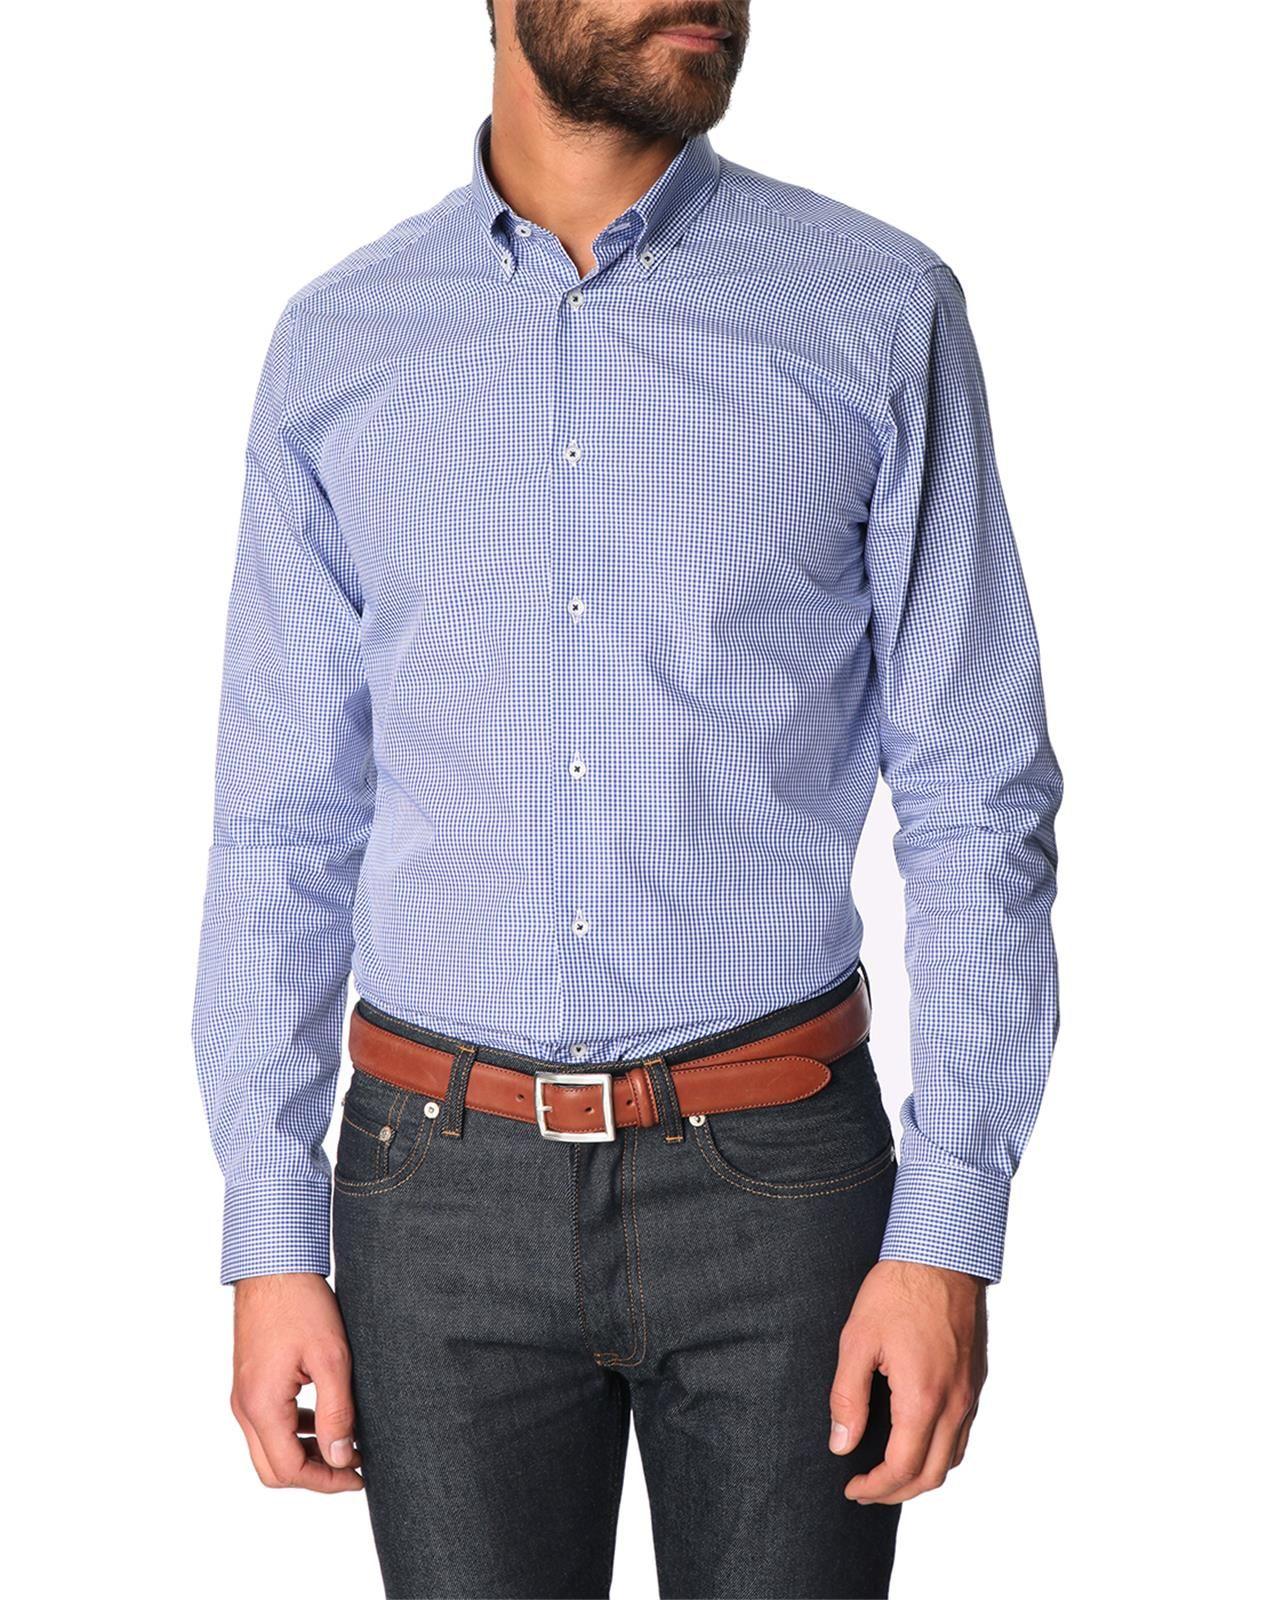 Atelier Priv Vichy Navy Slim Fit Shirt In Blue For Men Lyst